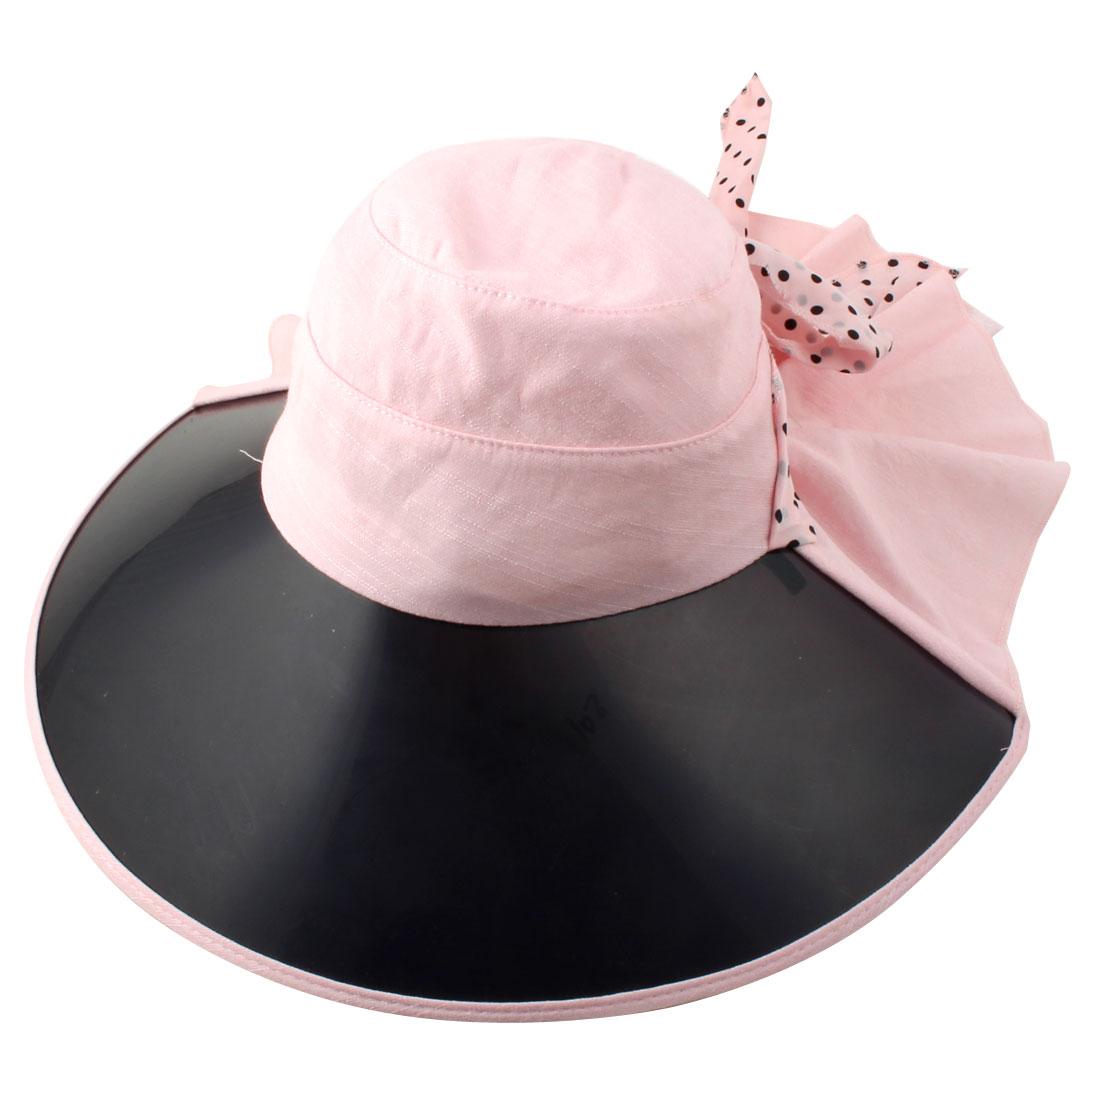 Ladies Women Vacation Travel Cycling Dots Decor Wide Brim Summer Sun Visor Protective Hat Pink